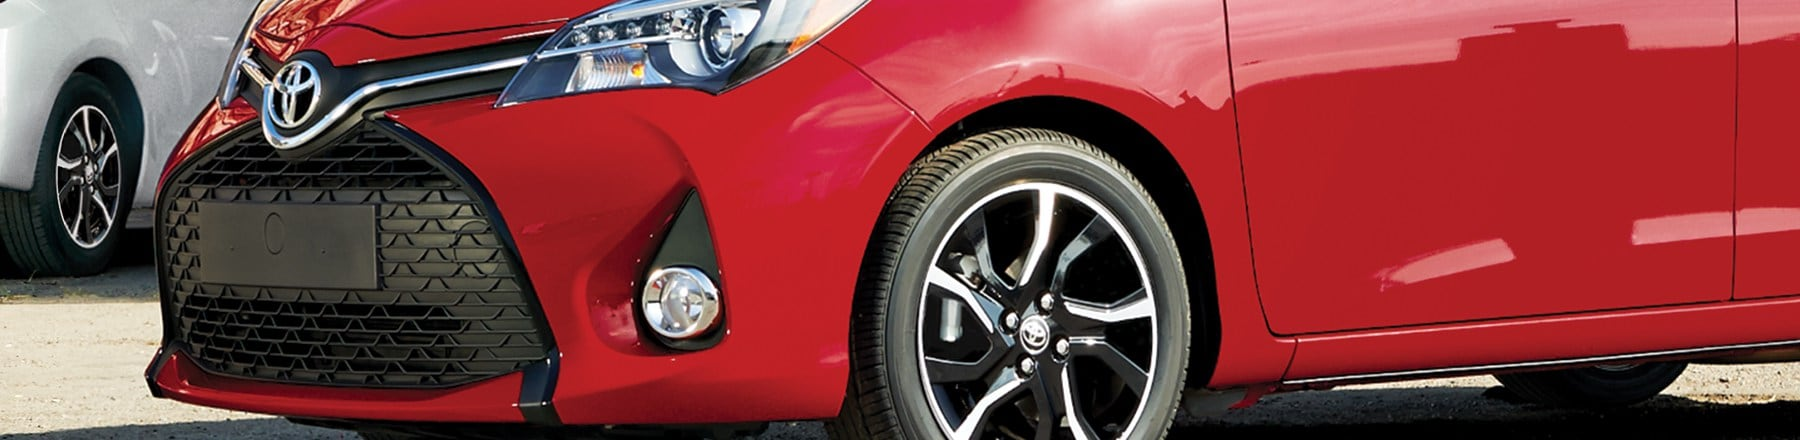 Tires Faq Cochrane Toyota Low Tire Pressure Warning Light